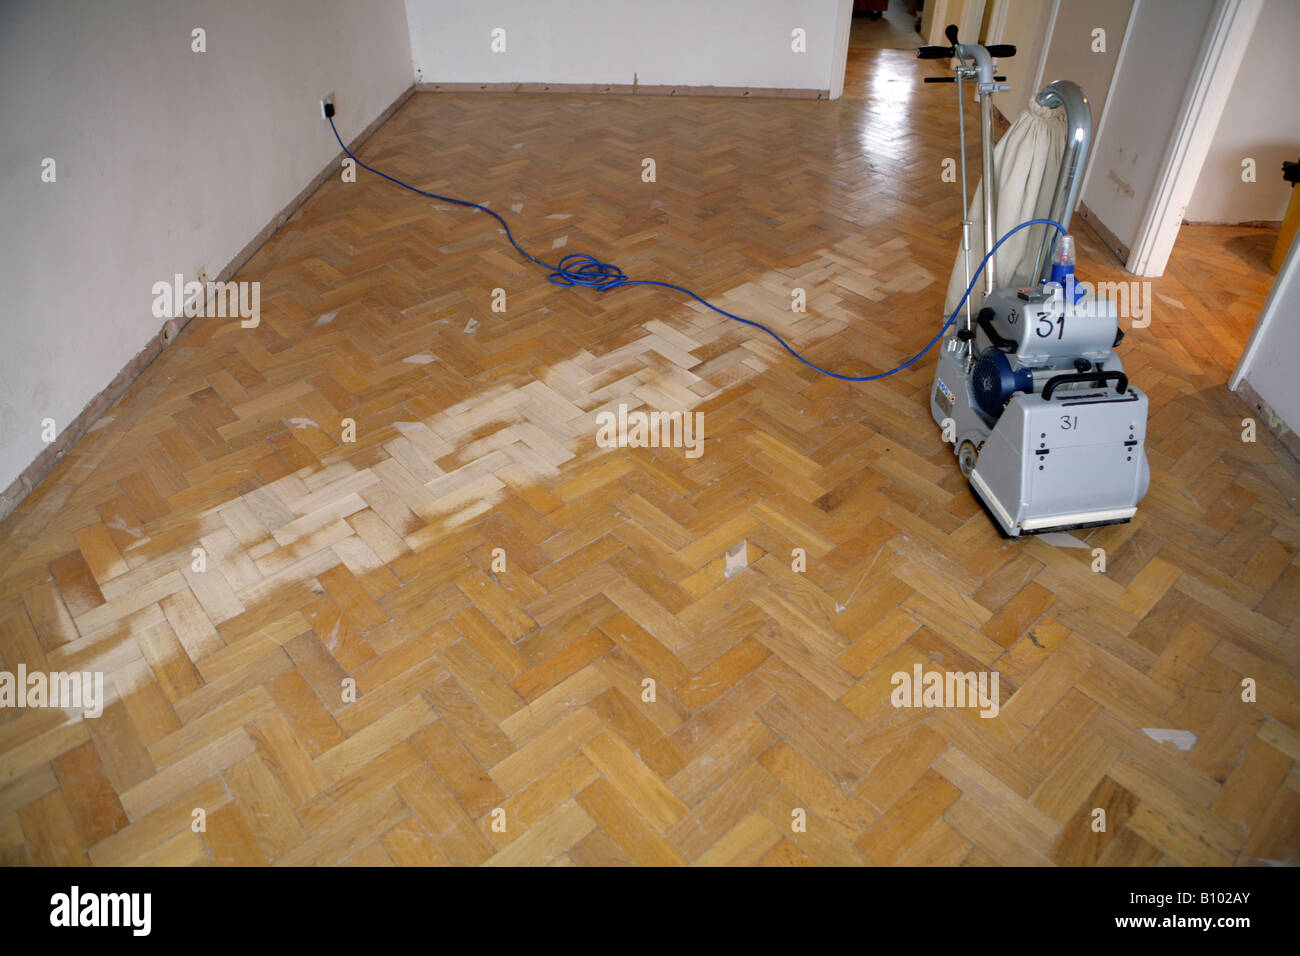 Sanding Reclaimed Oak Parquet Flooring Stock Photo Alamy - How much is parkay flooring